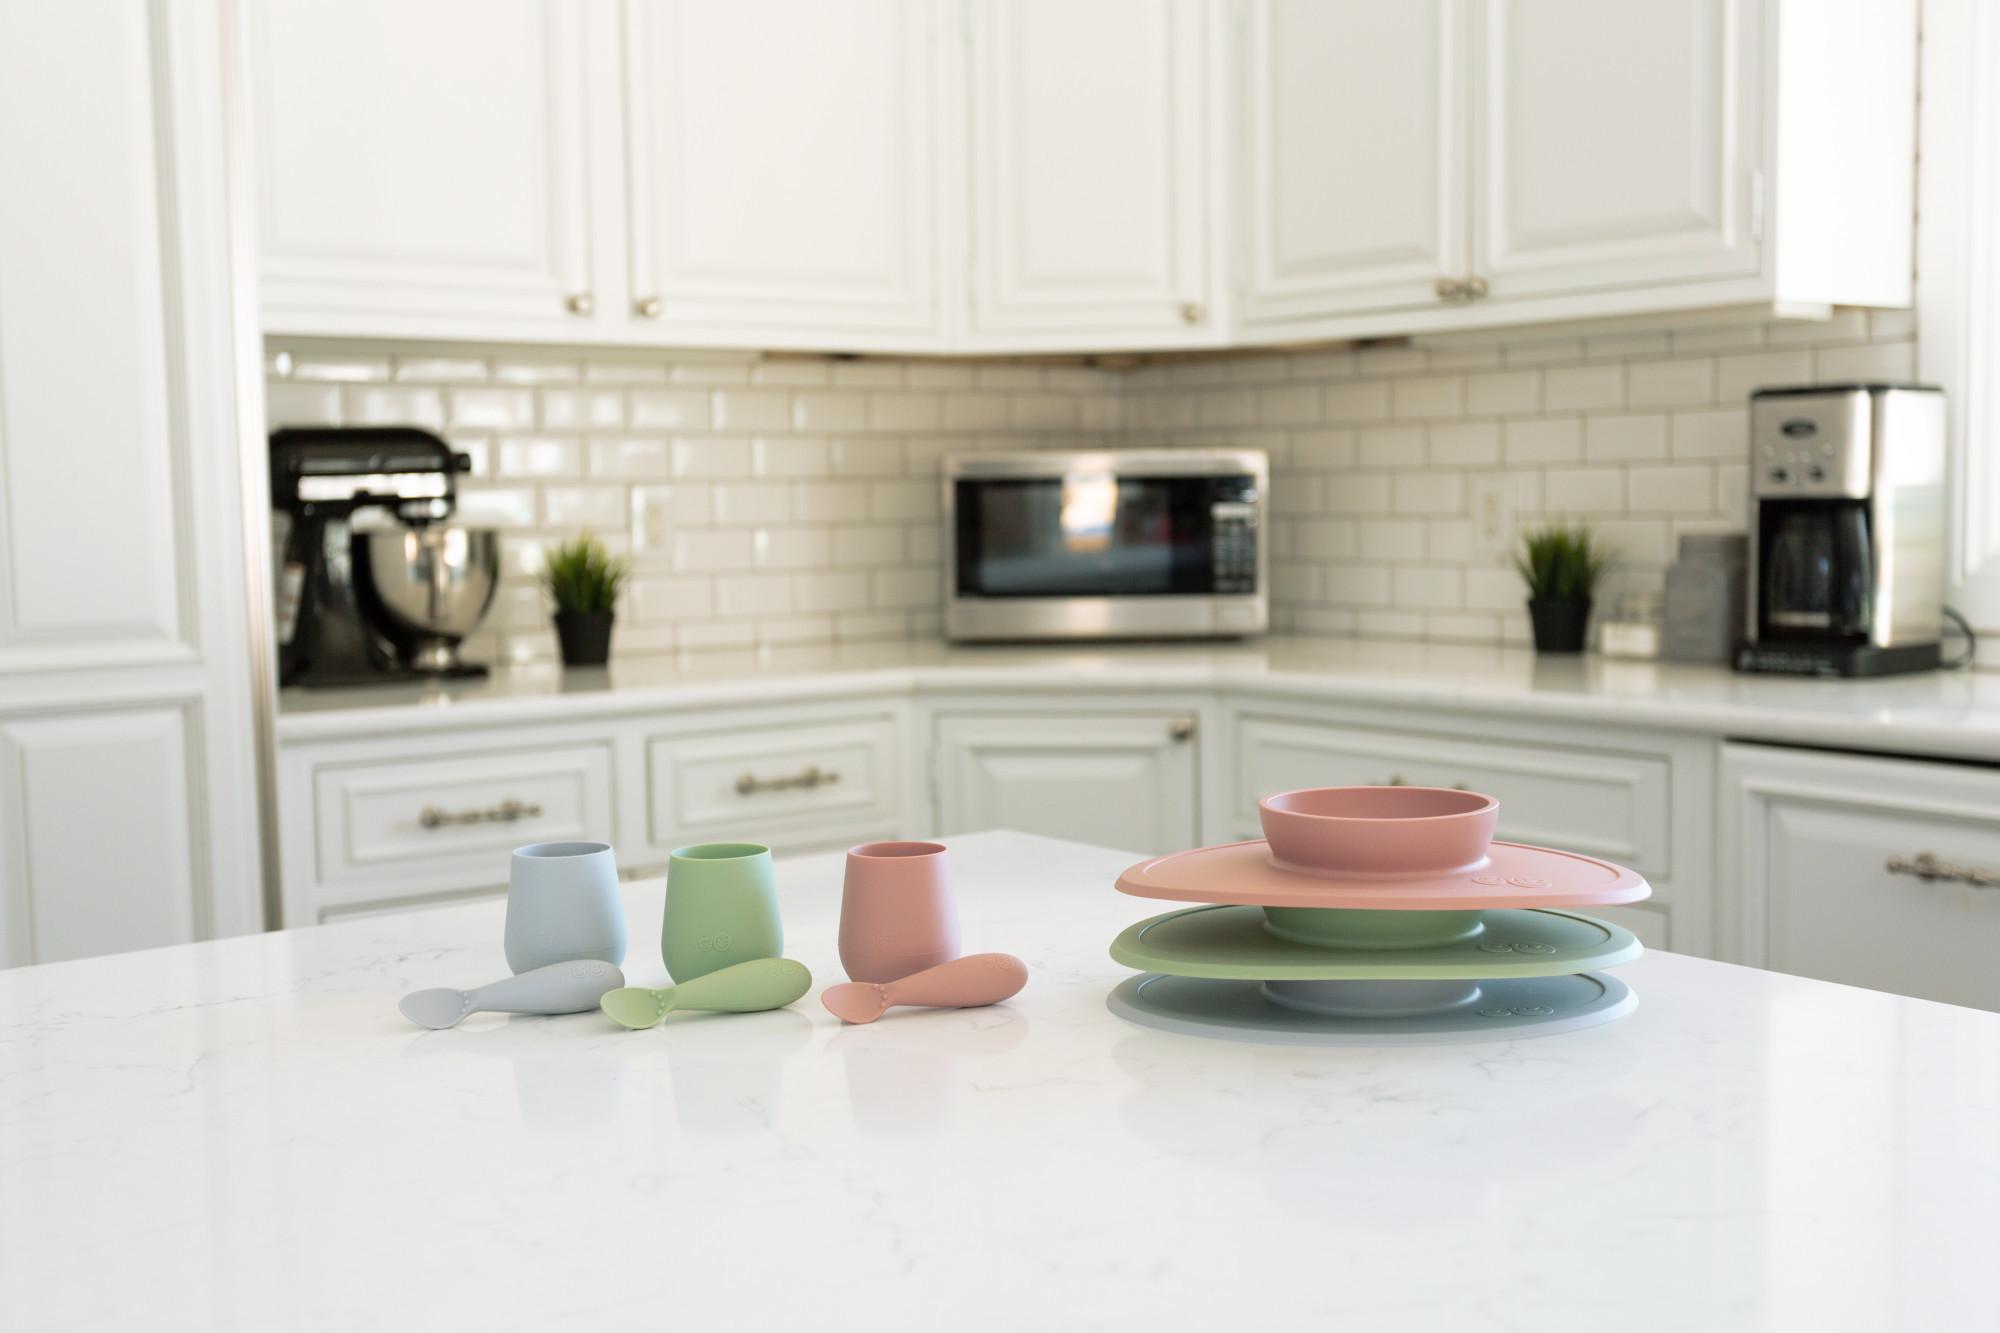 Набор из 4-х предметов цвет светло-серый EZPZ First Food Set